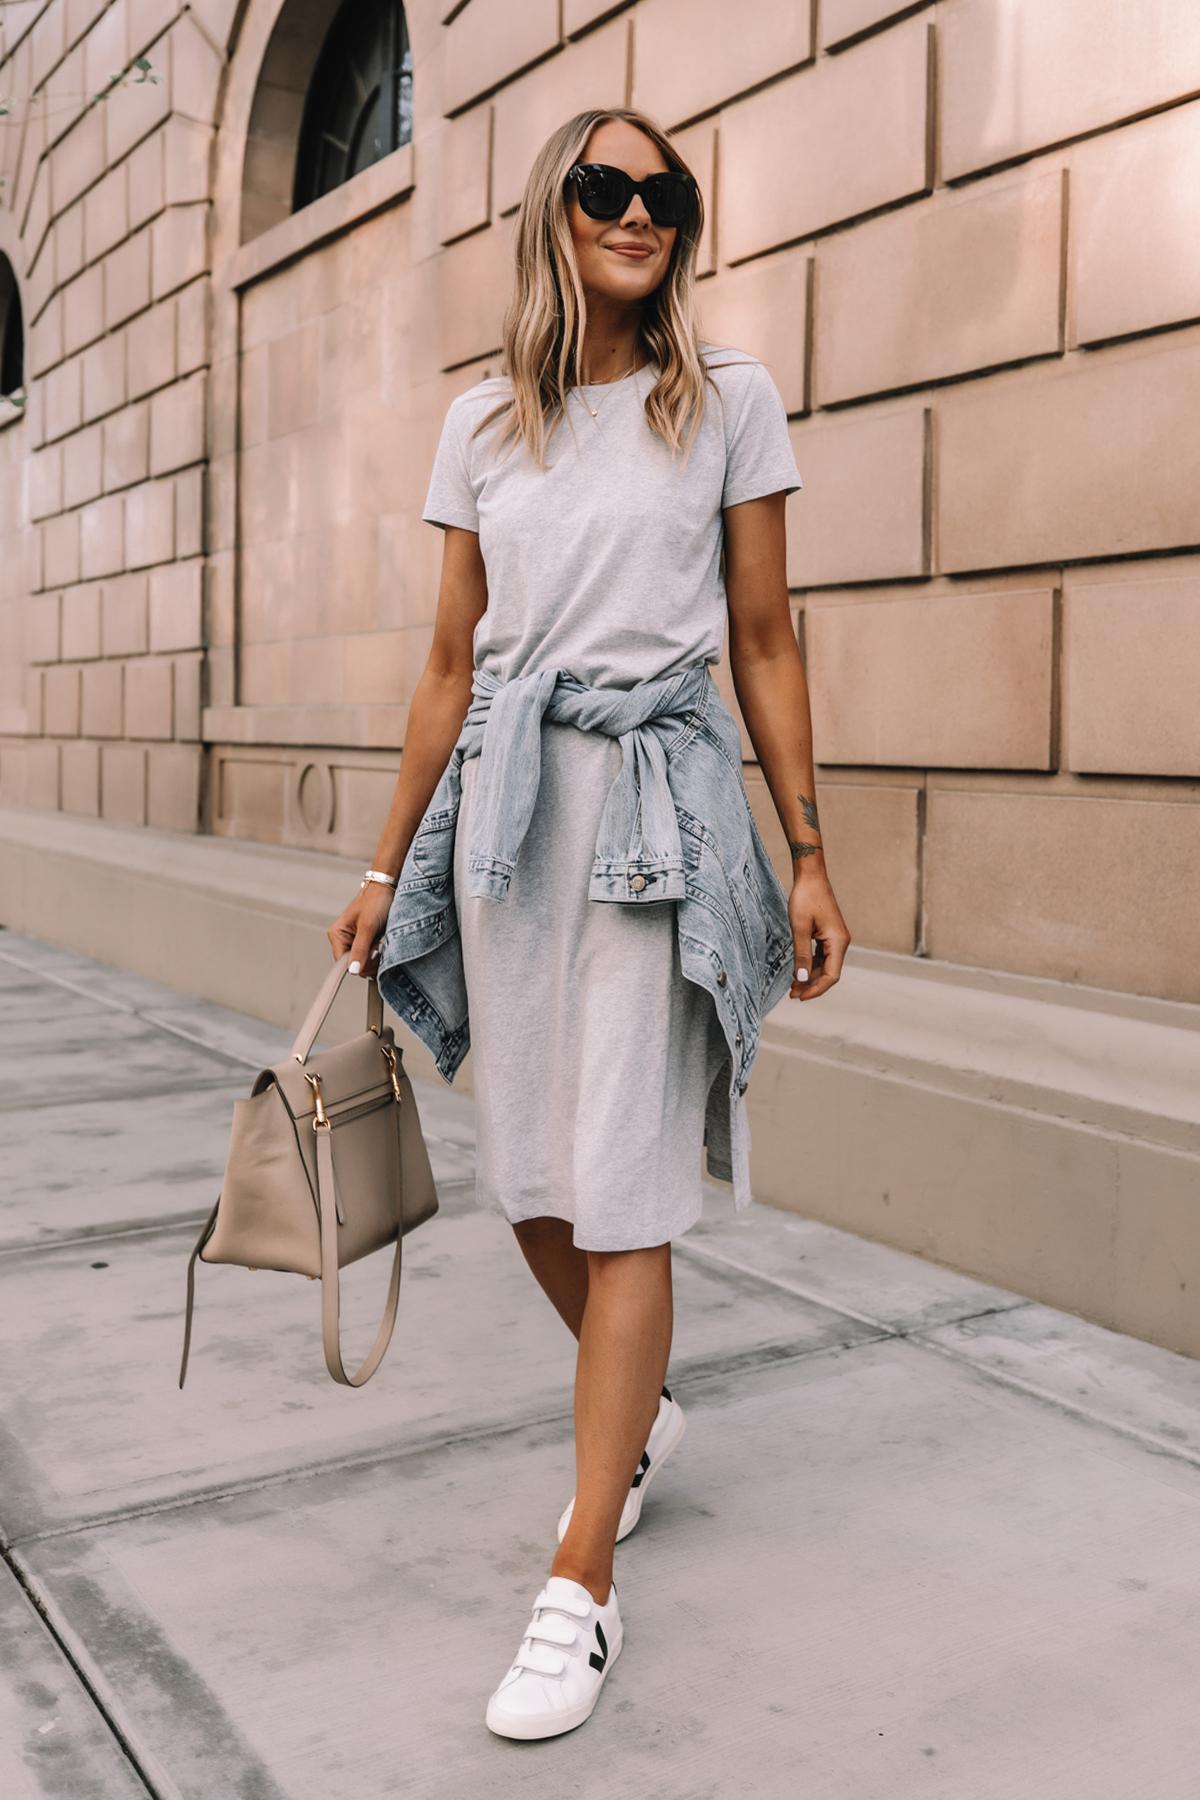 Fashion Jackson Wearing Jcrew Grey Midi Tshirt Dress Denim Jacket Veja Velcro Sneakers Celine Belt Bag Street Style Summer Outfit 1